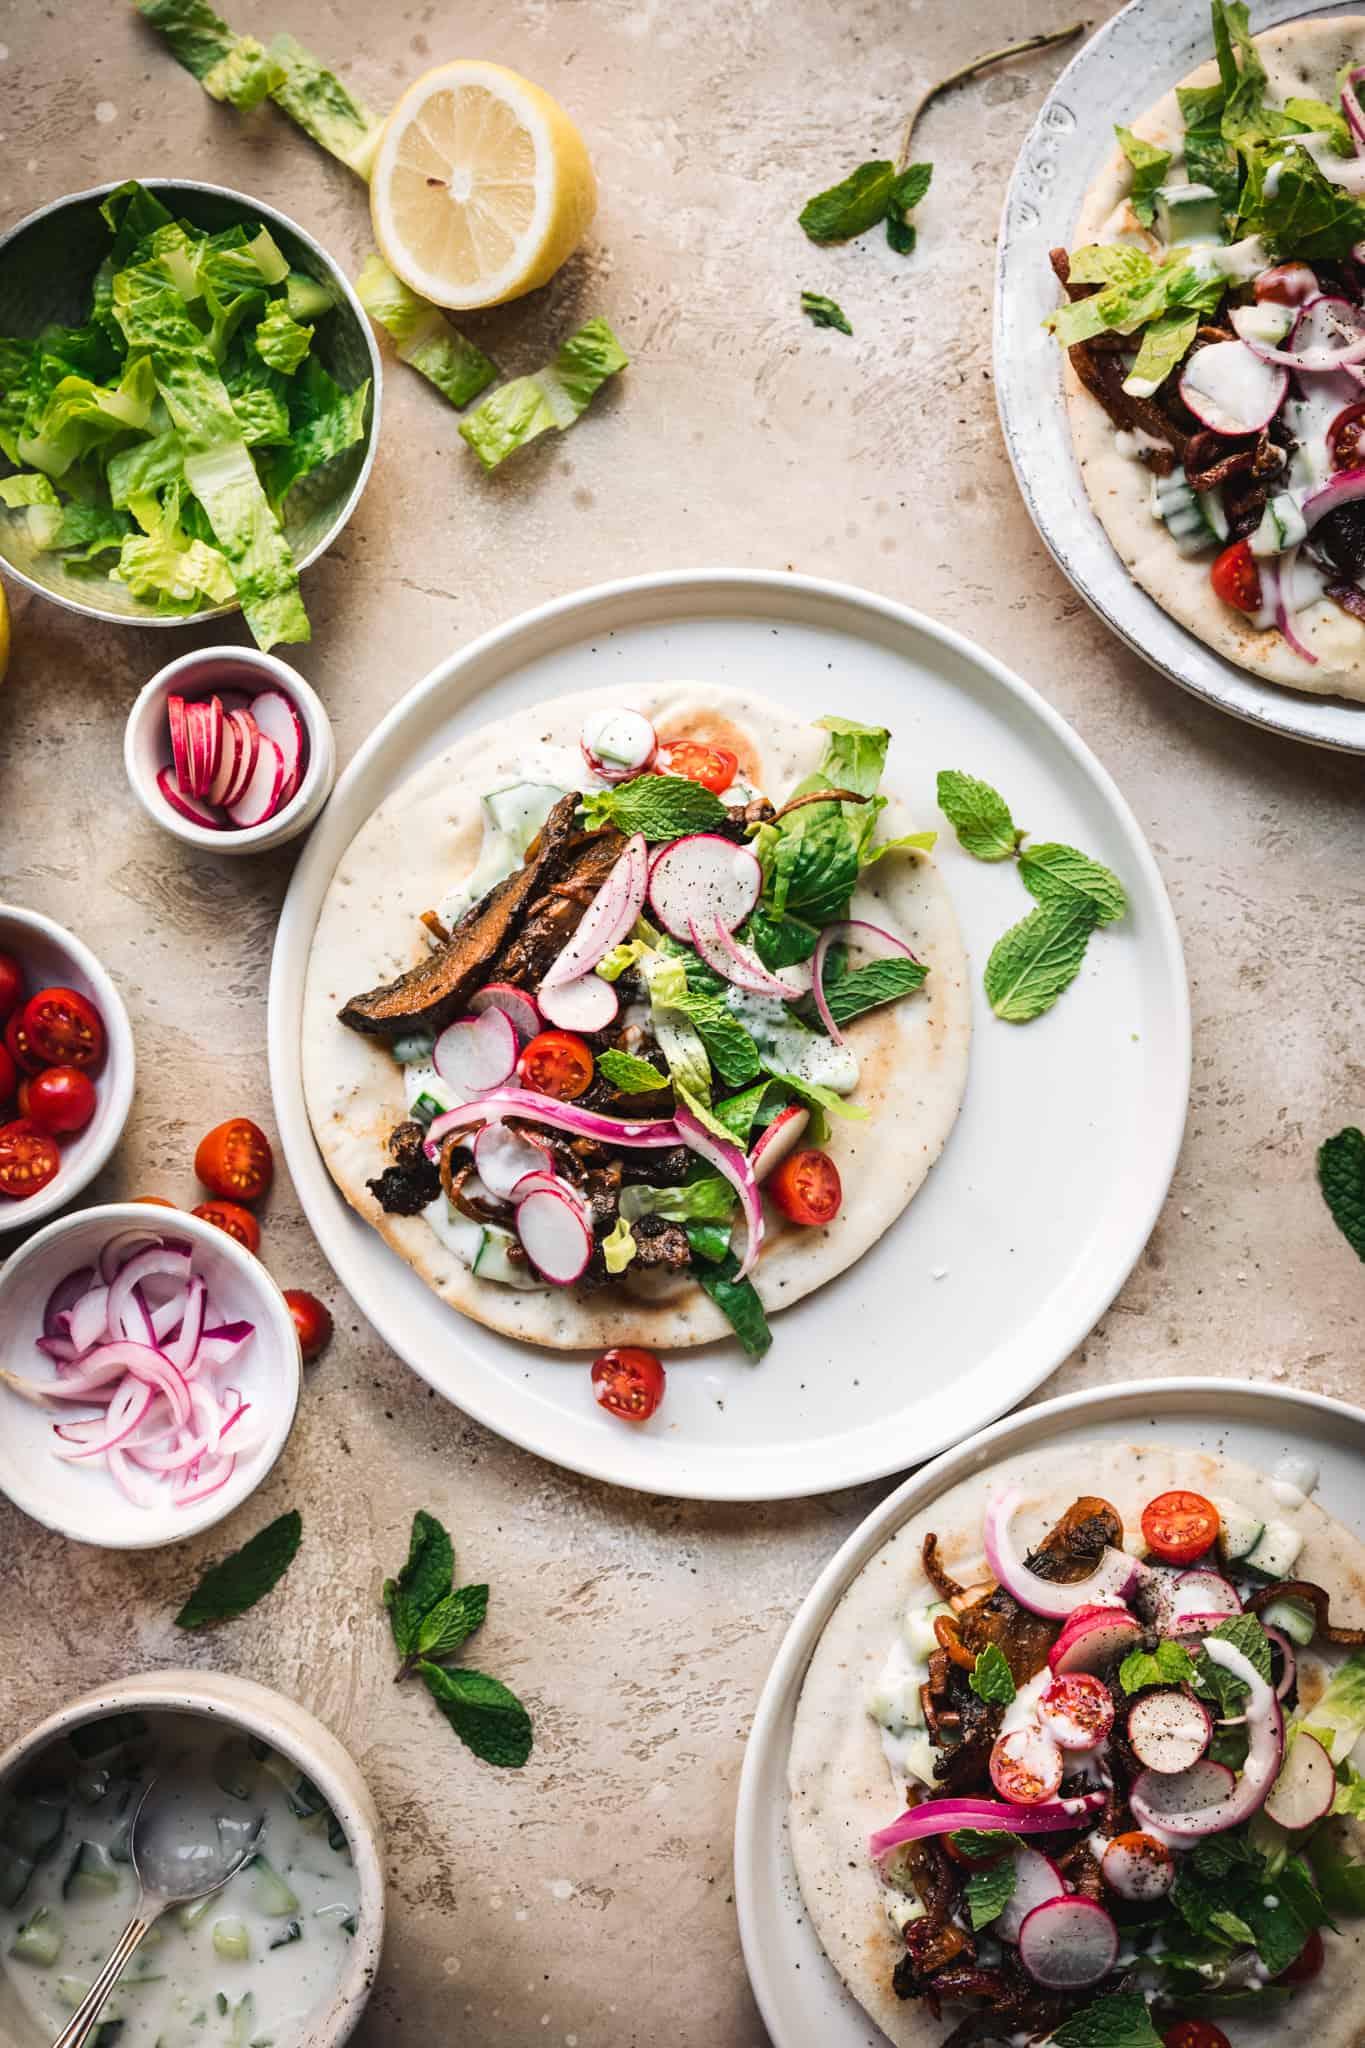 overhead view of vegan mushroom shawarma on pita with vegetarian toppings